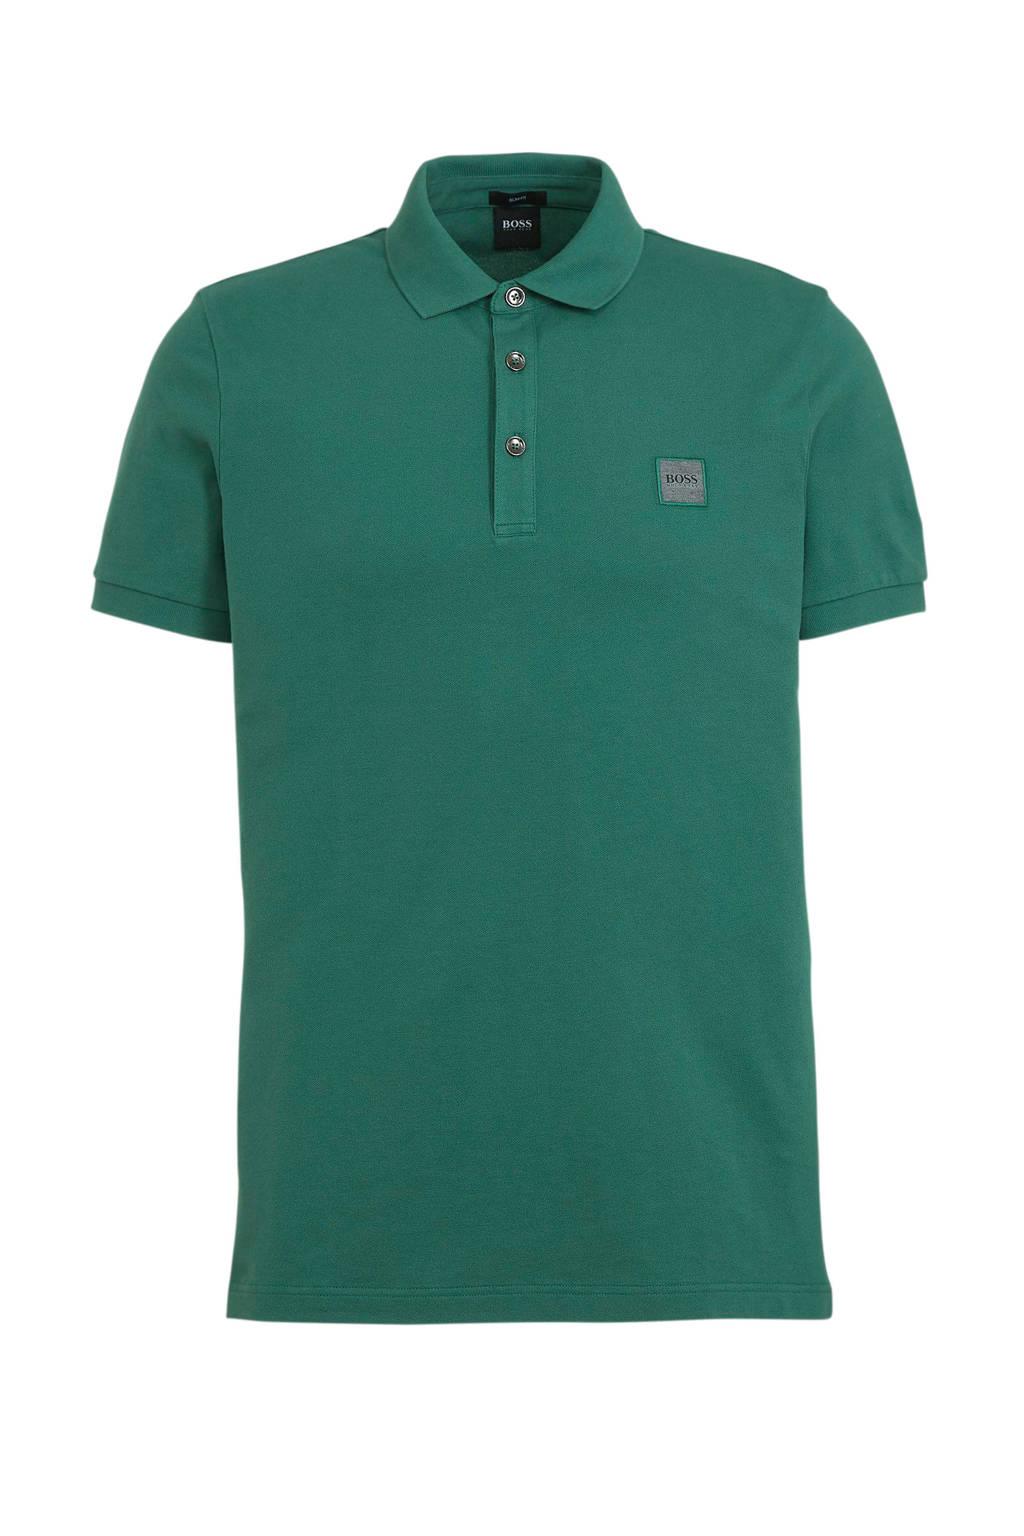 BOSS Casual slim fit polo Passenger medium green, Medium green